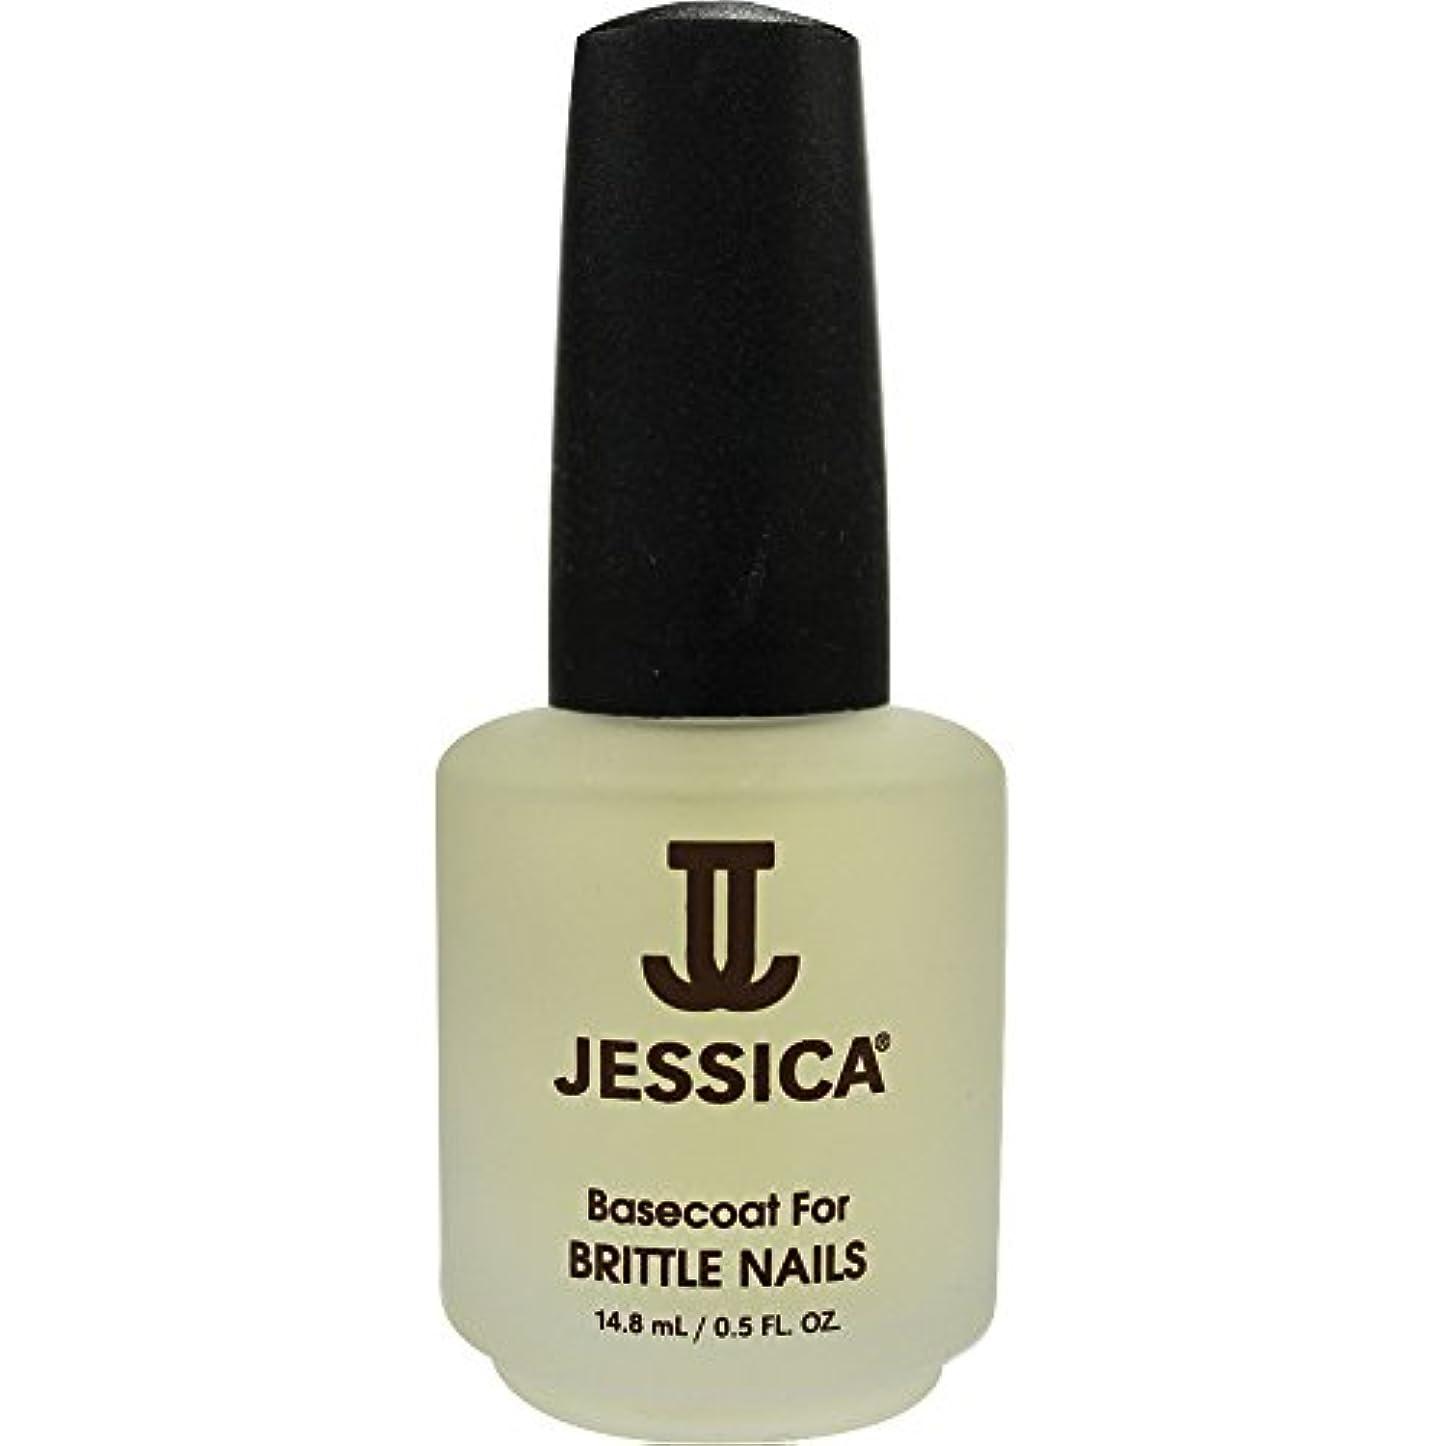 JESSICA ベースコート ブリトル  14.8ml